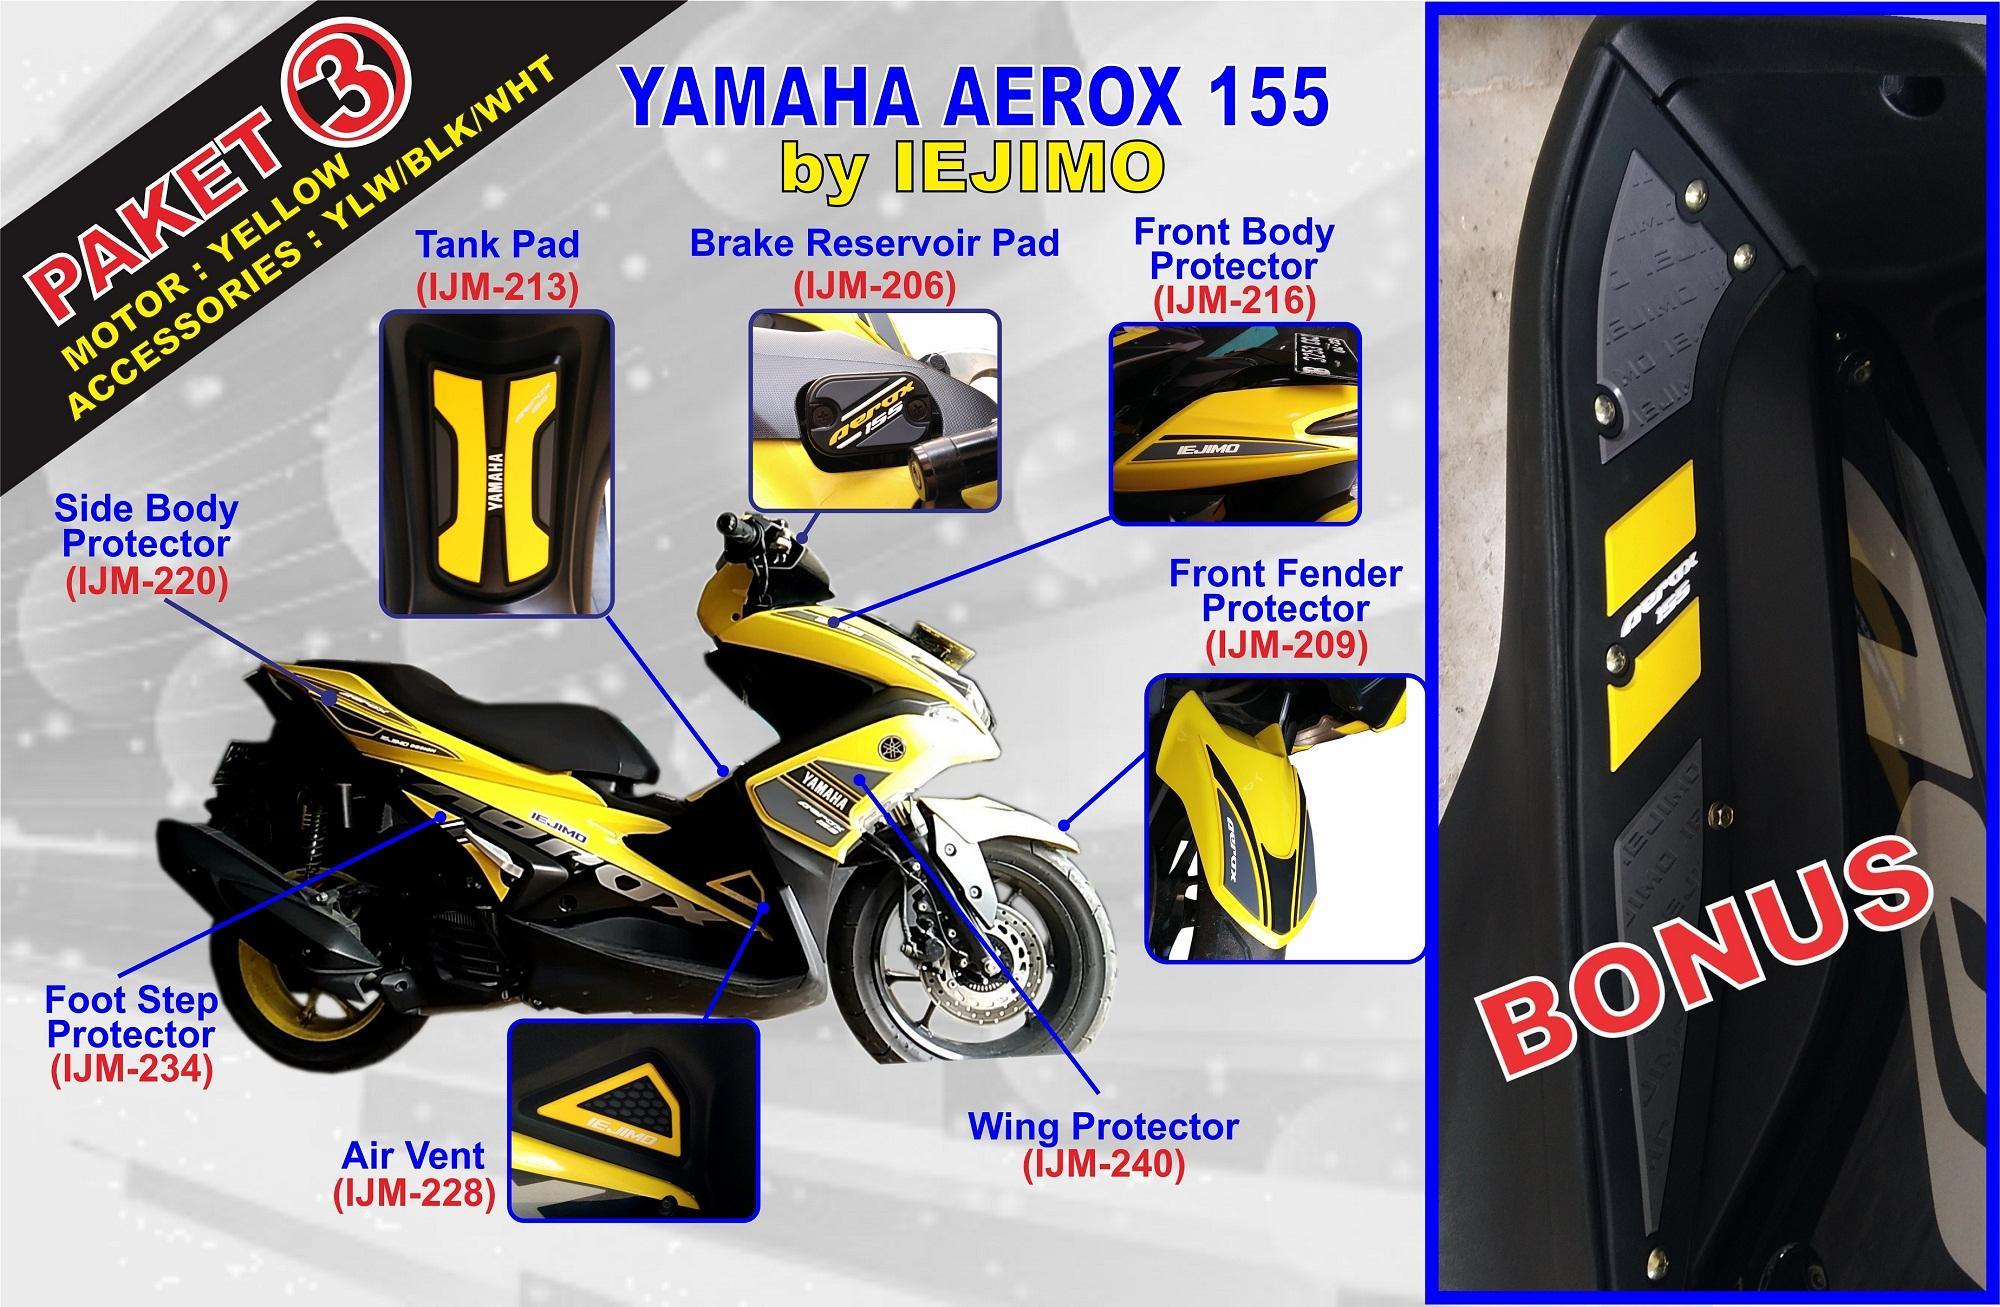 PAKET BODY PROTECTOR YAMAHA AEROX 155 - AKSESORIS AEROX 155